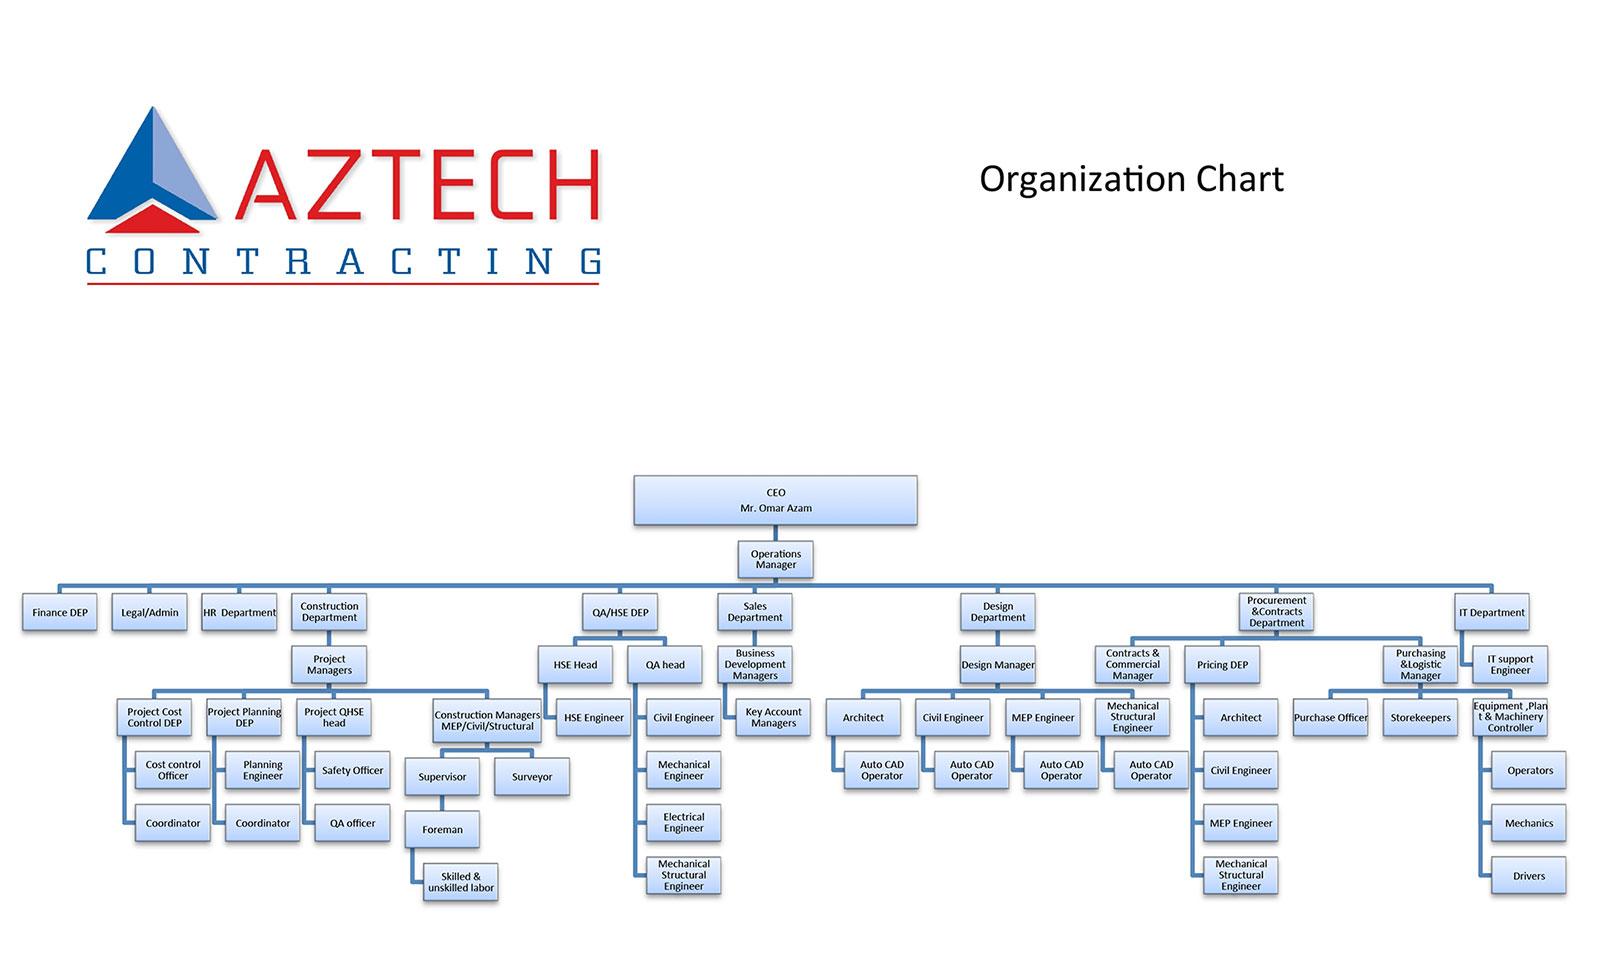 Mechanical Engineering Org Chart : Organization chart aztech contracting